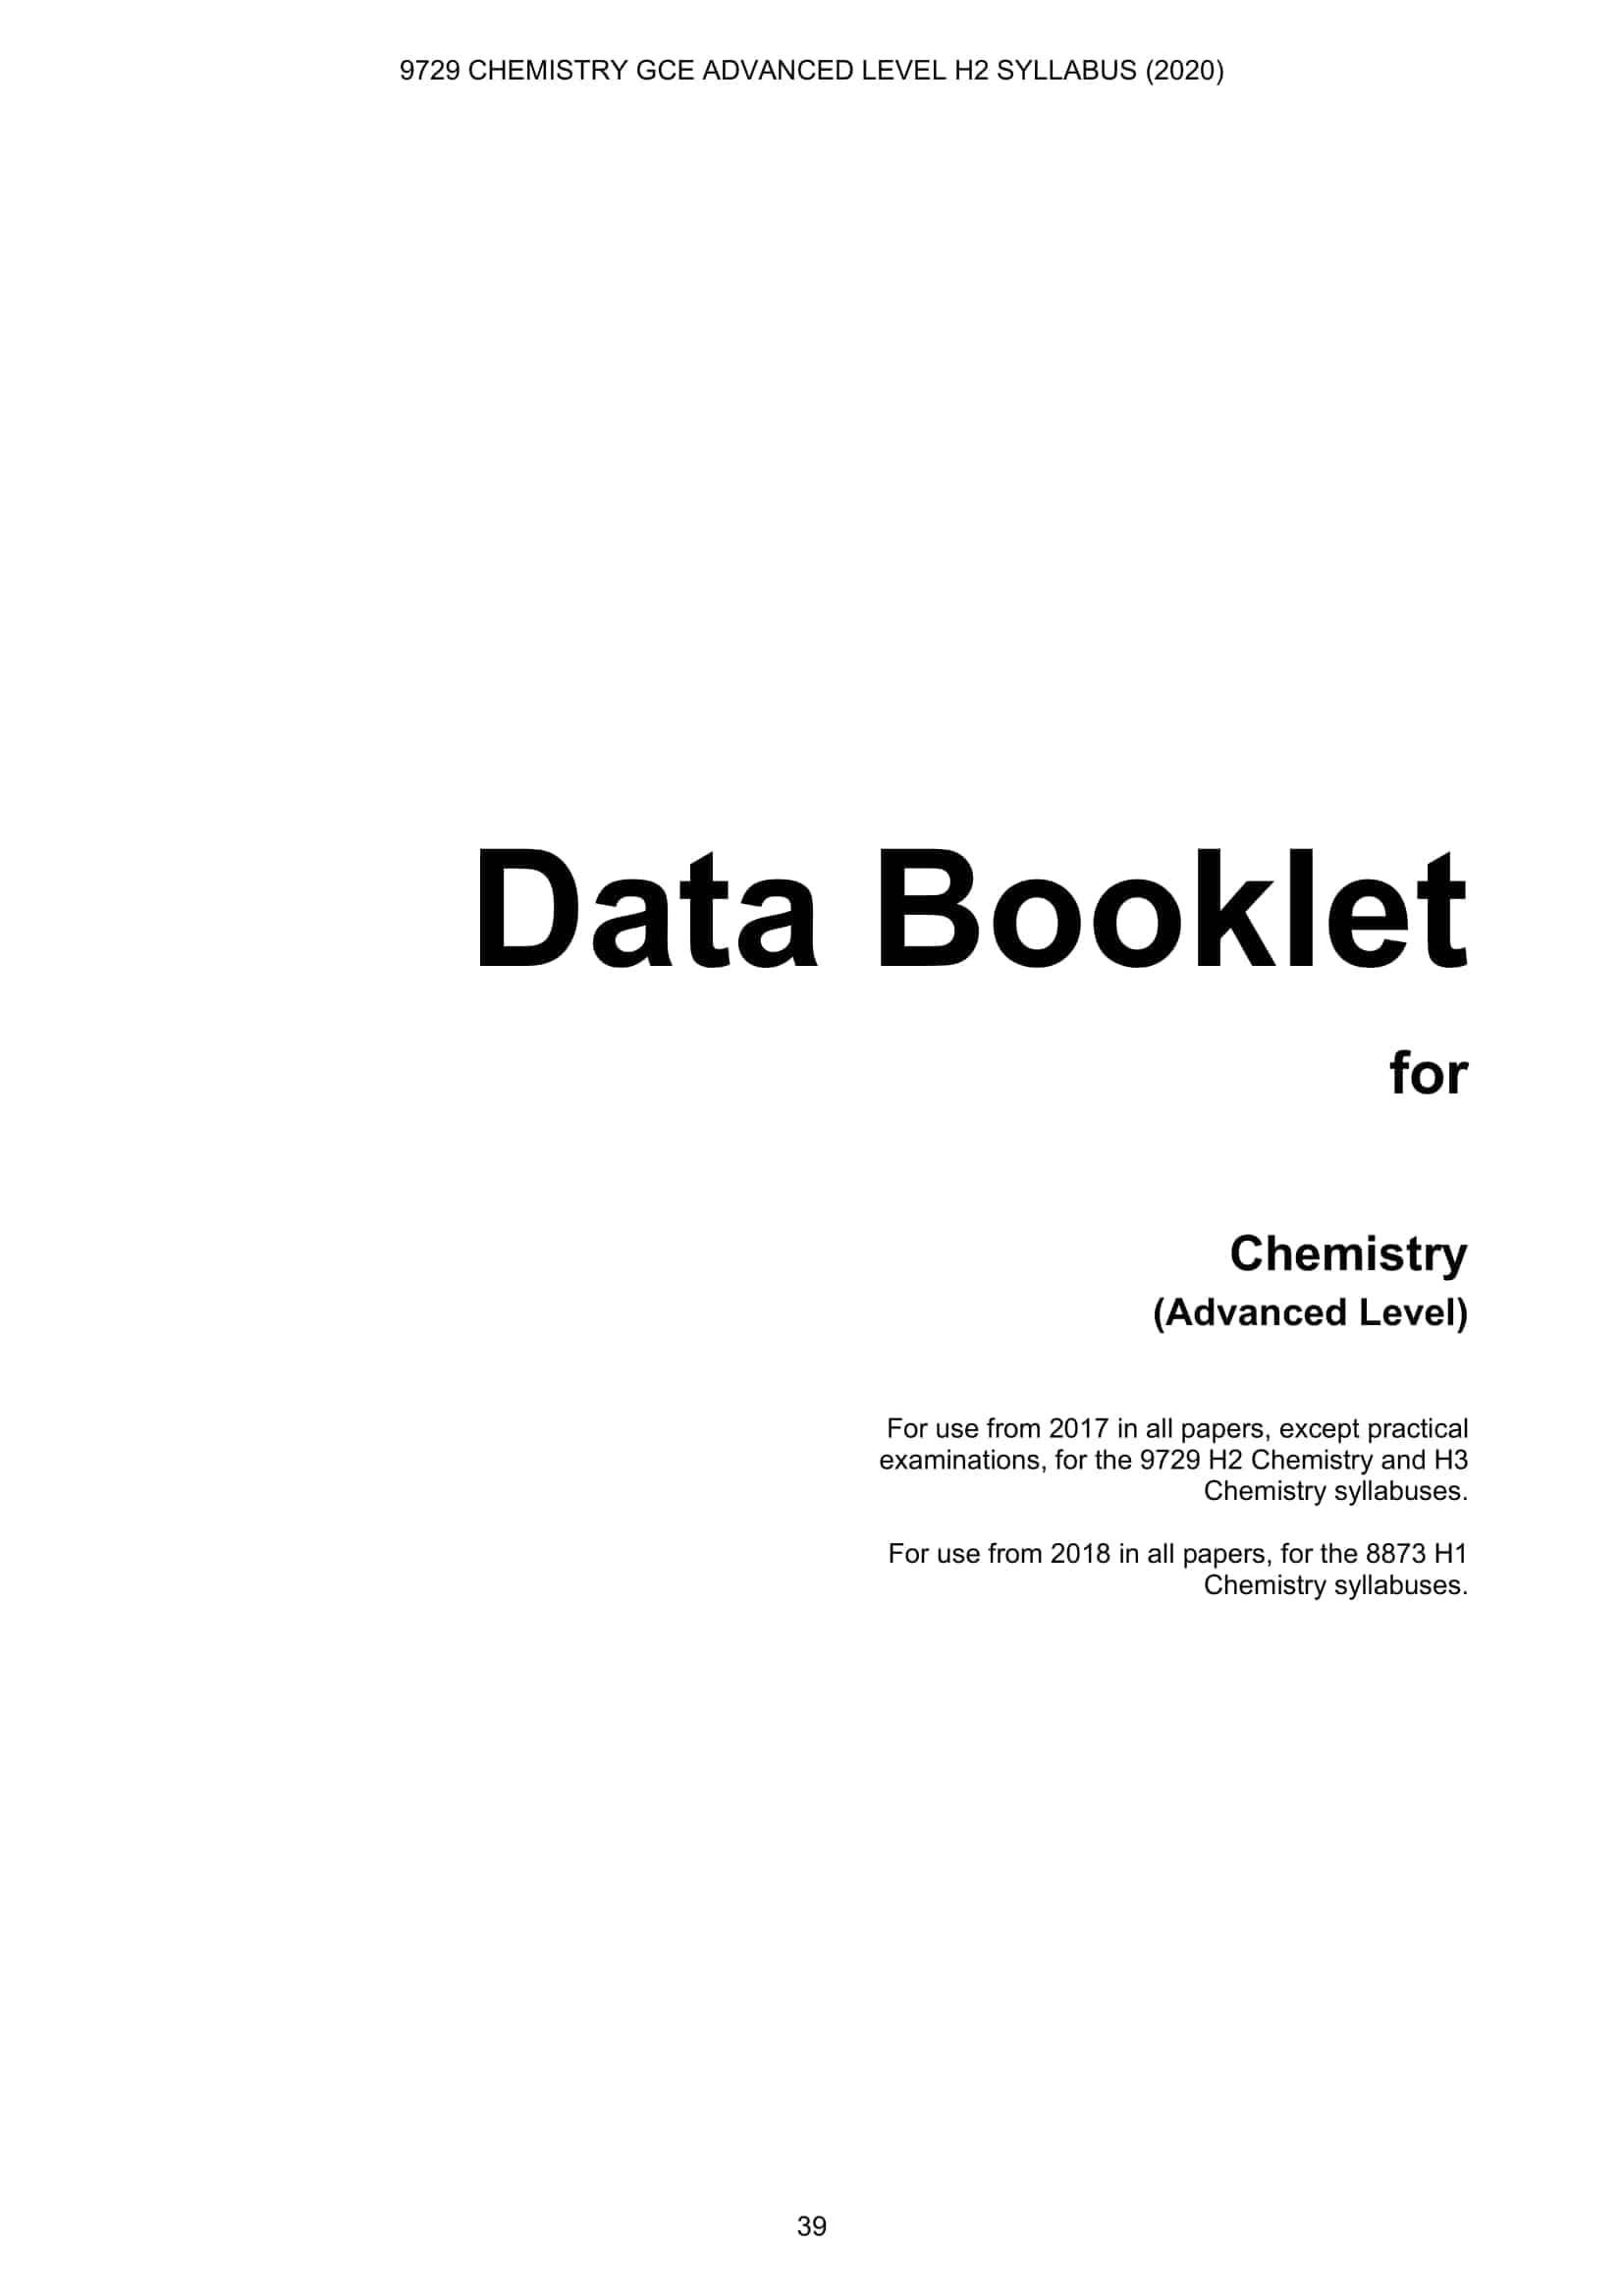 Chemistry Data Booklet 1